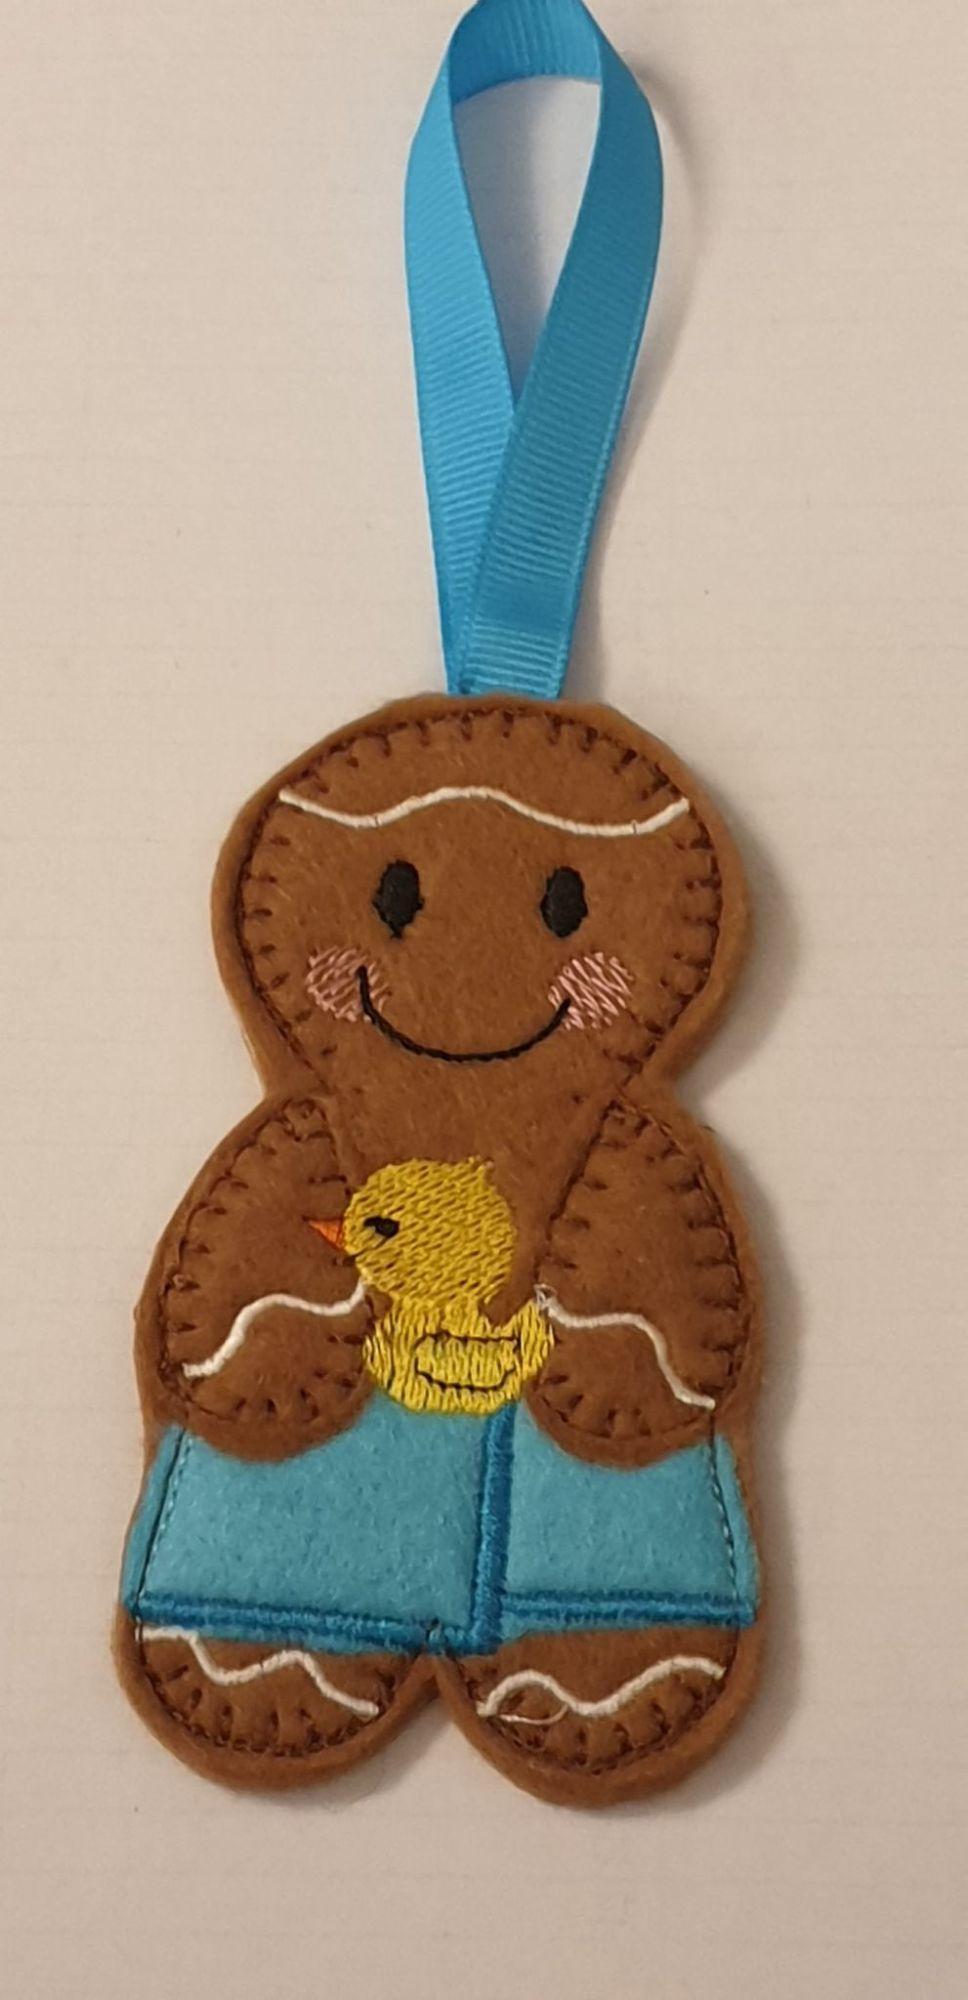 Beautician Gingerbread